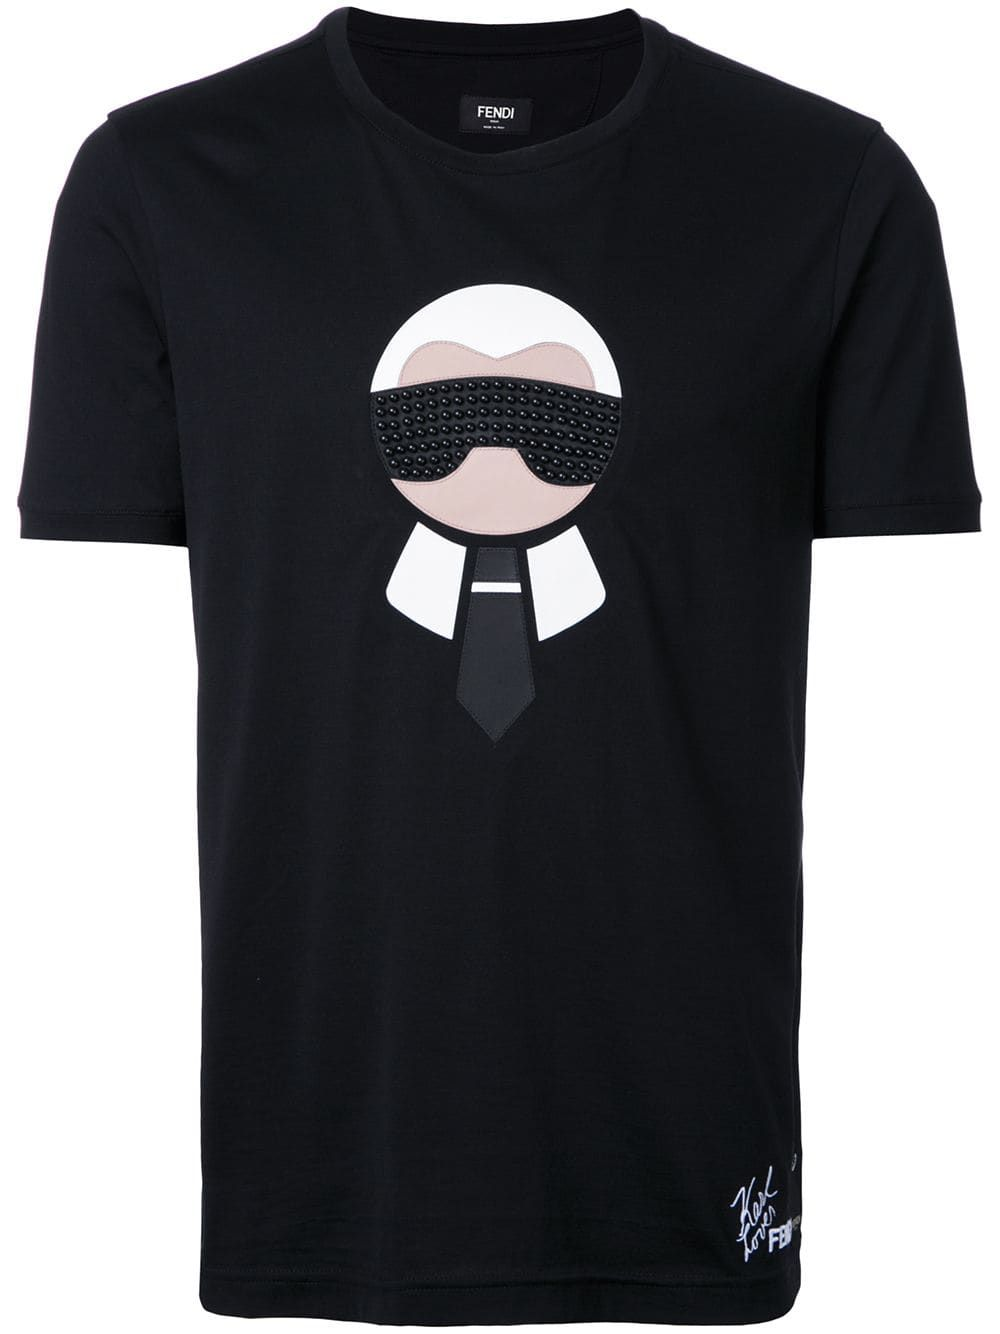 09096cd0 Fendi 'Karl Loves Fendi' T-shirt - Black | Products in 2019 | Fendi ...